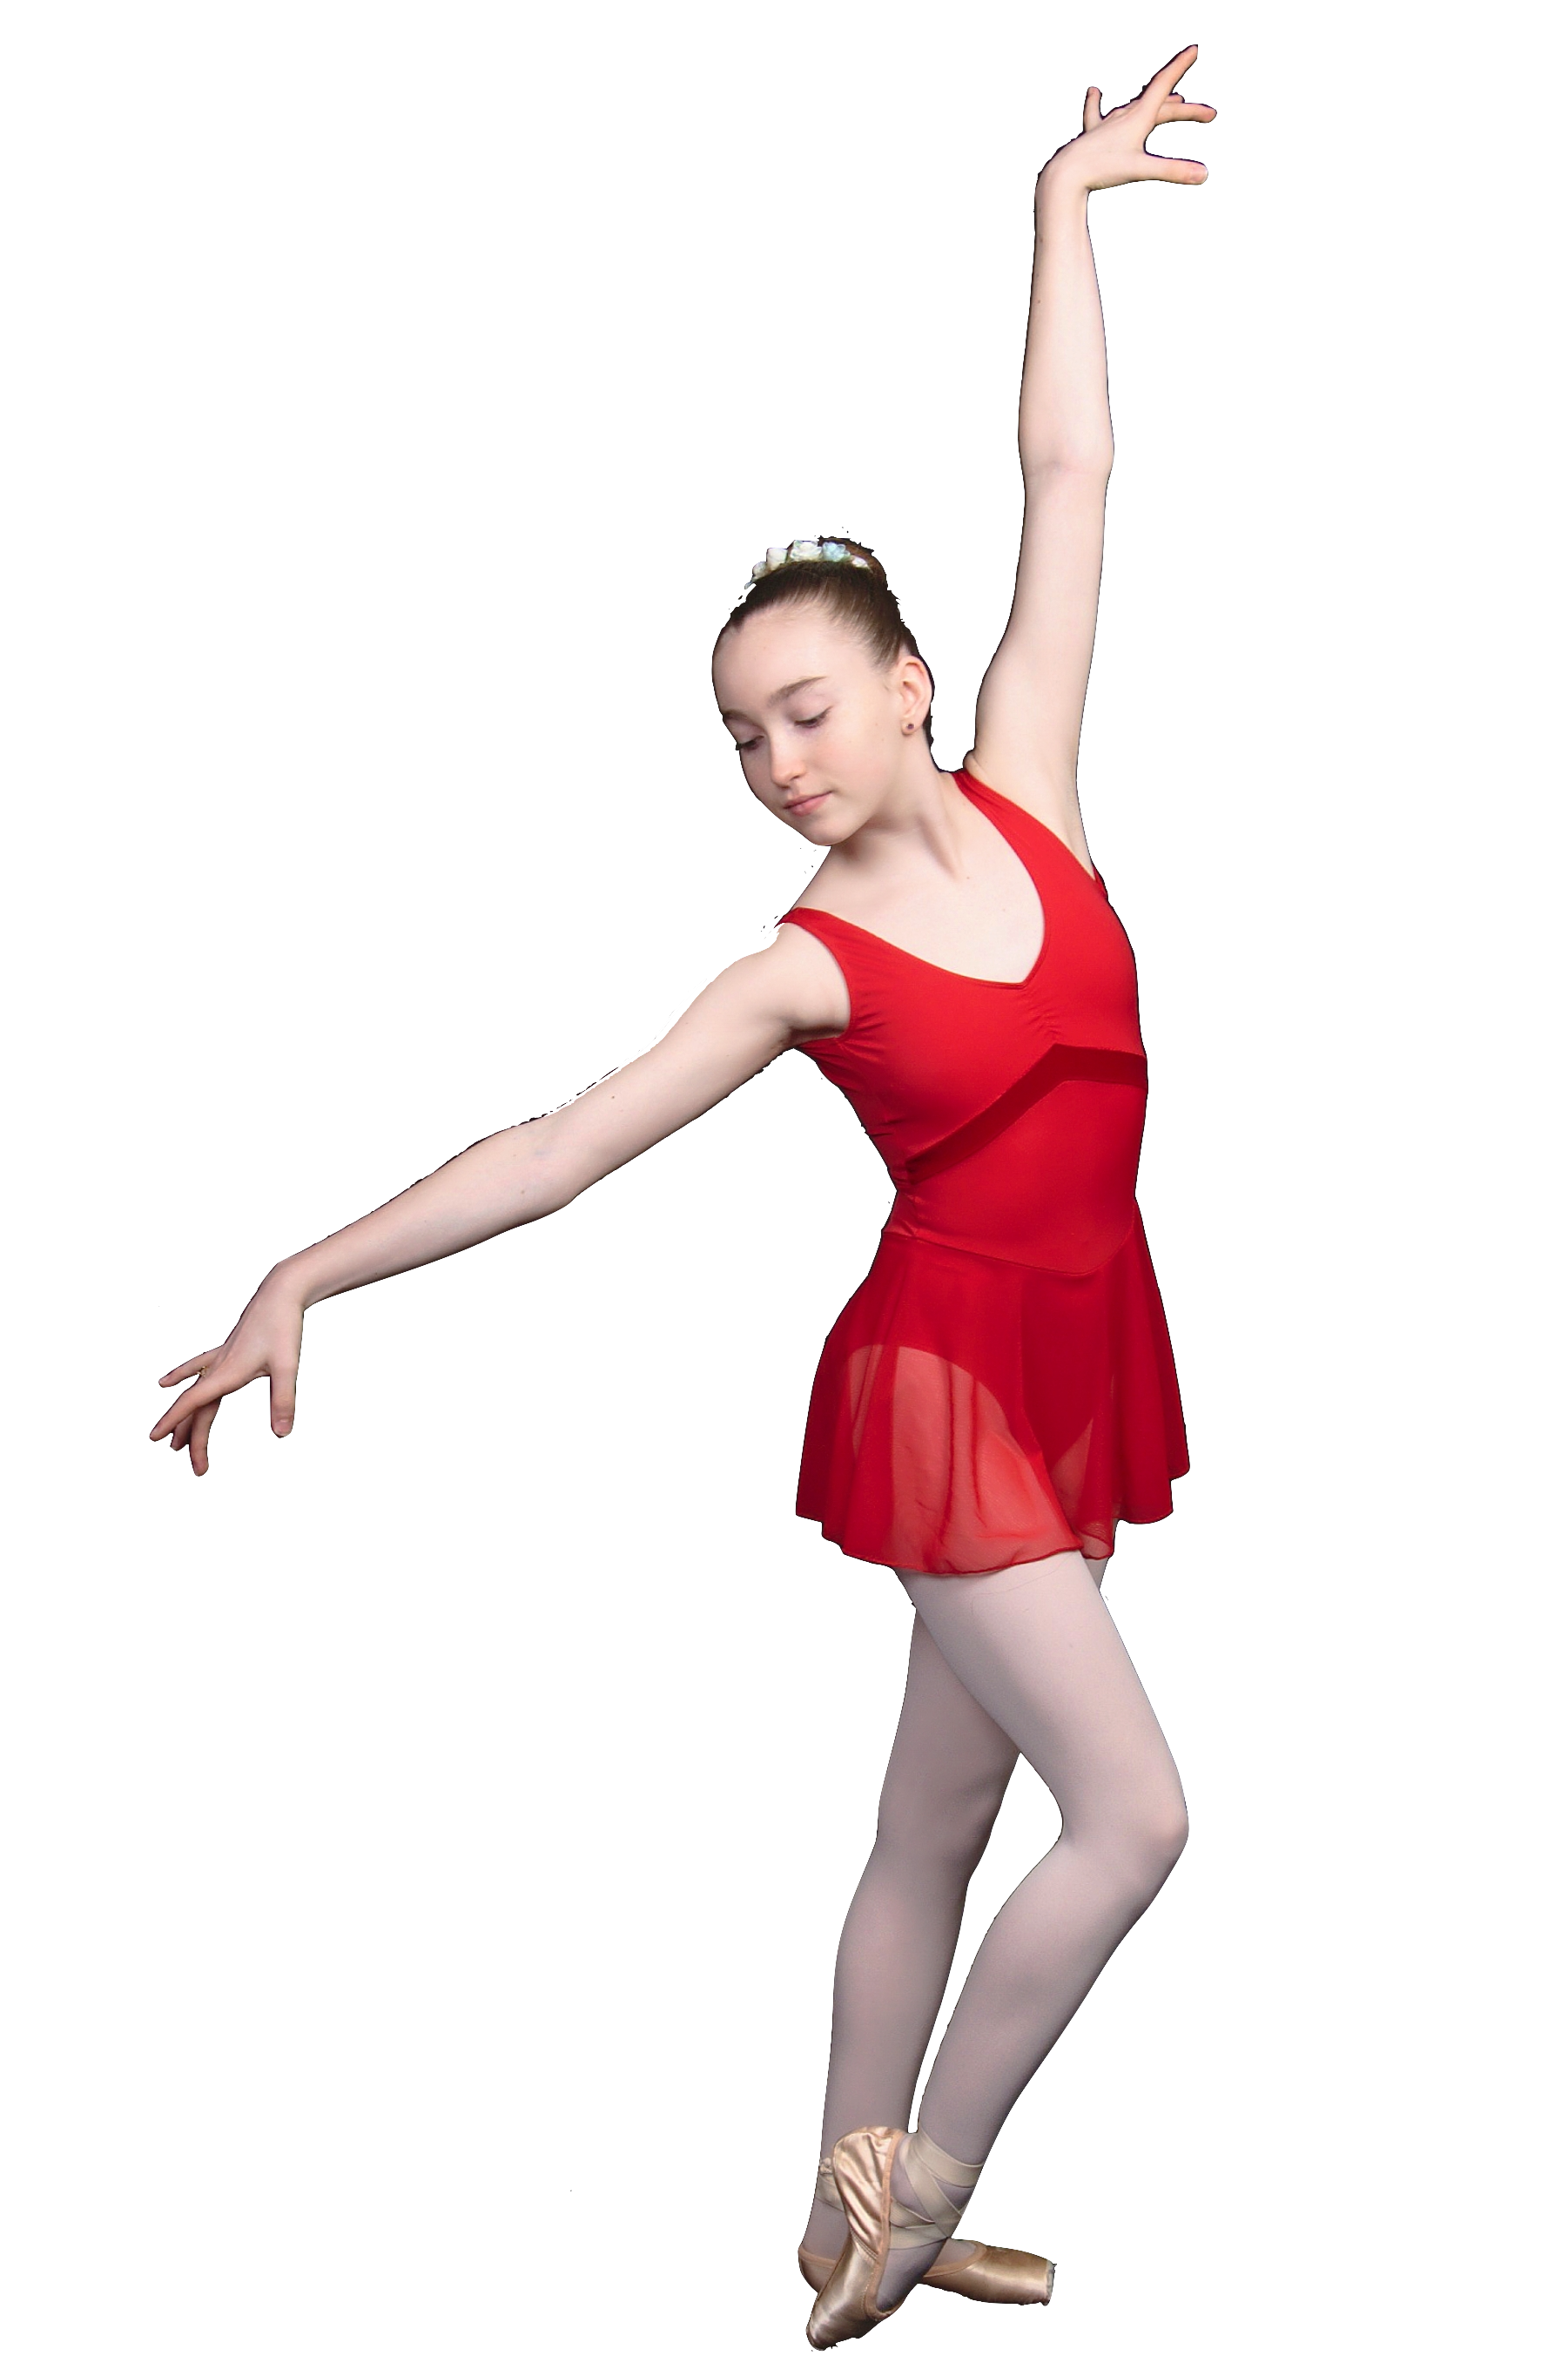 """Aurora"" Skirted Leotard - The Simple and Elegant Costume - Custom Designed Leotards - Child and Adult Sizes"